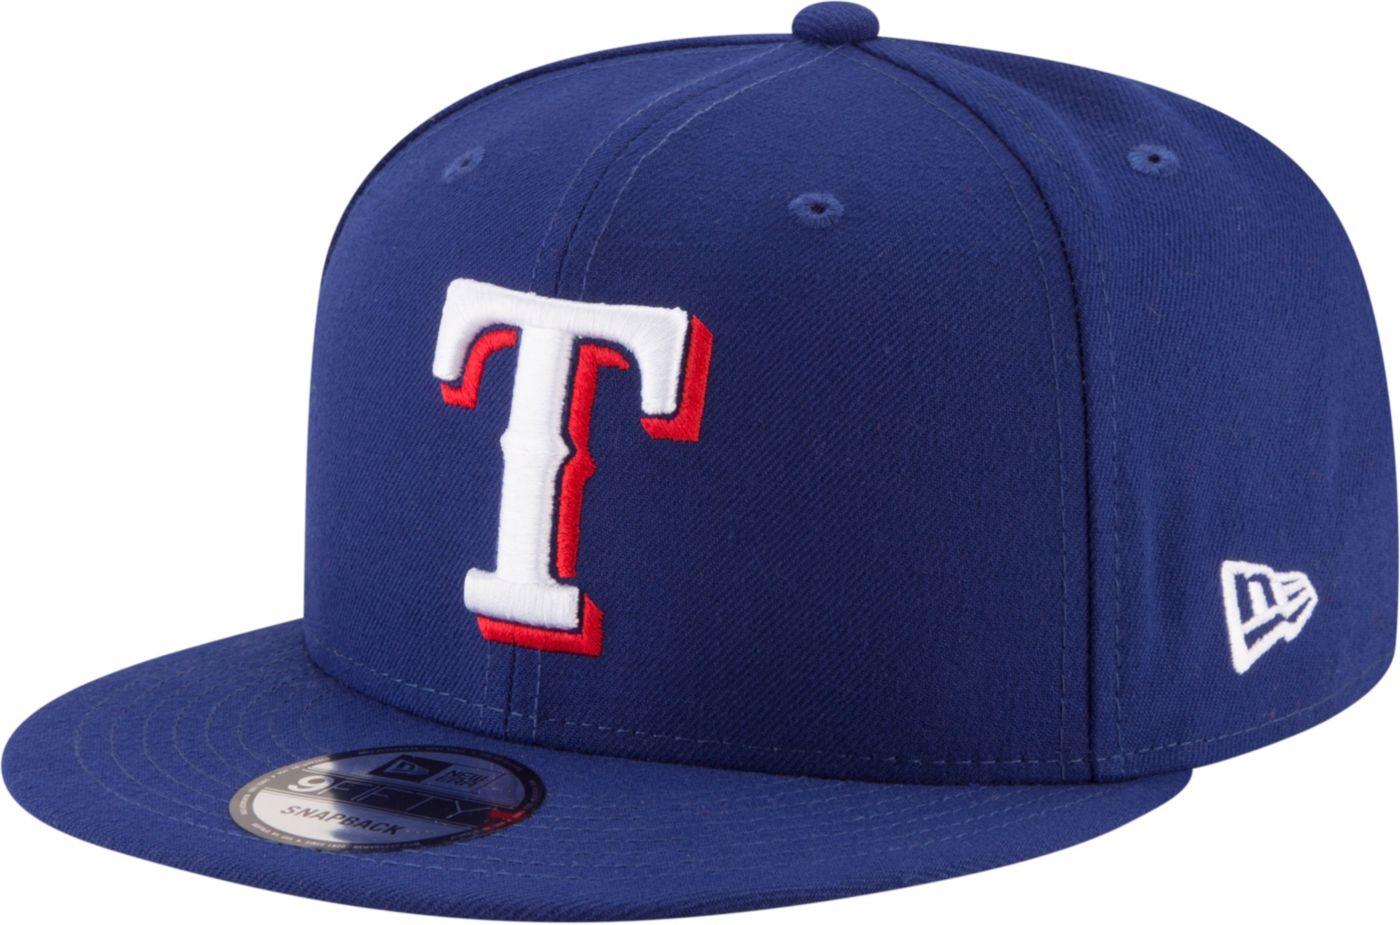 New Era Men's Texas Rangers 9Fifty Adjustable Snapback Hat